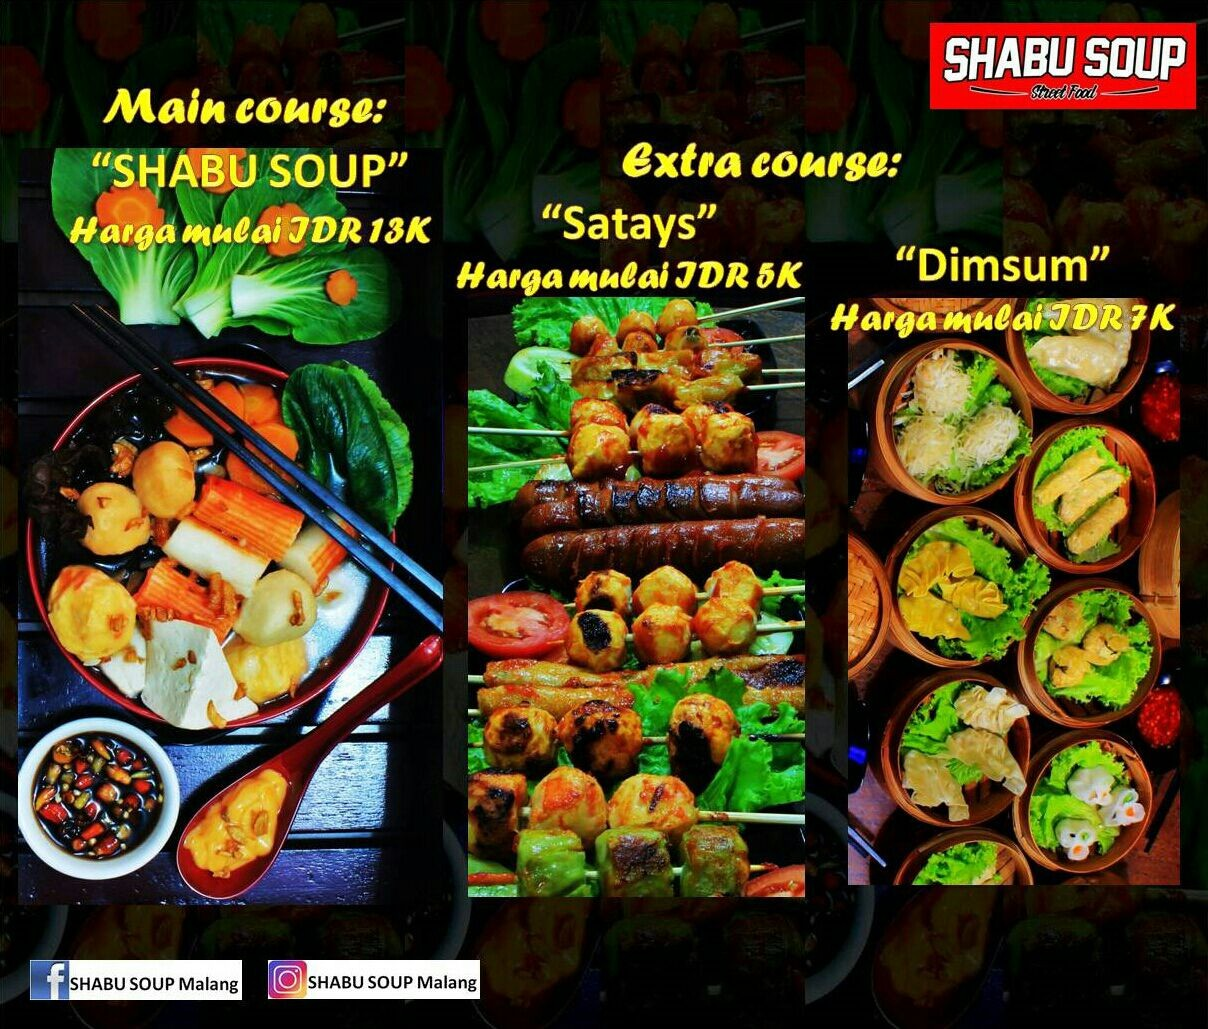 Shabu Soup Malang